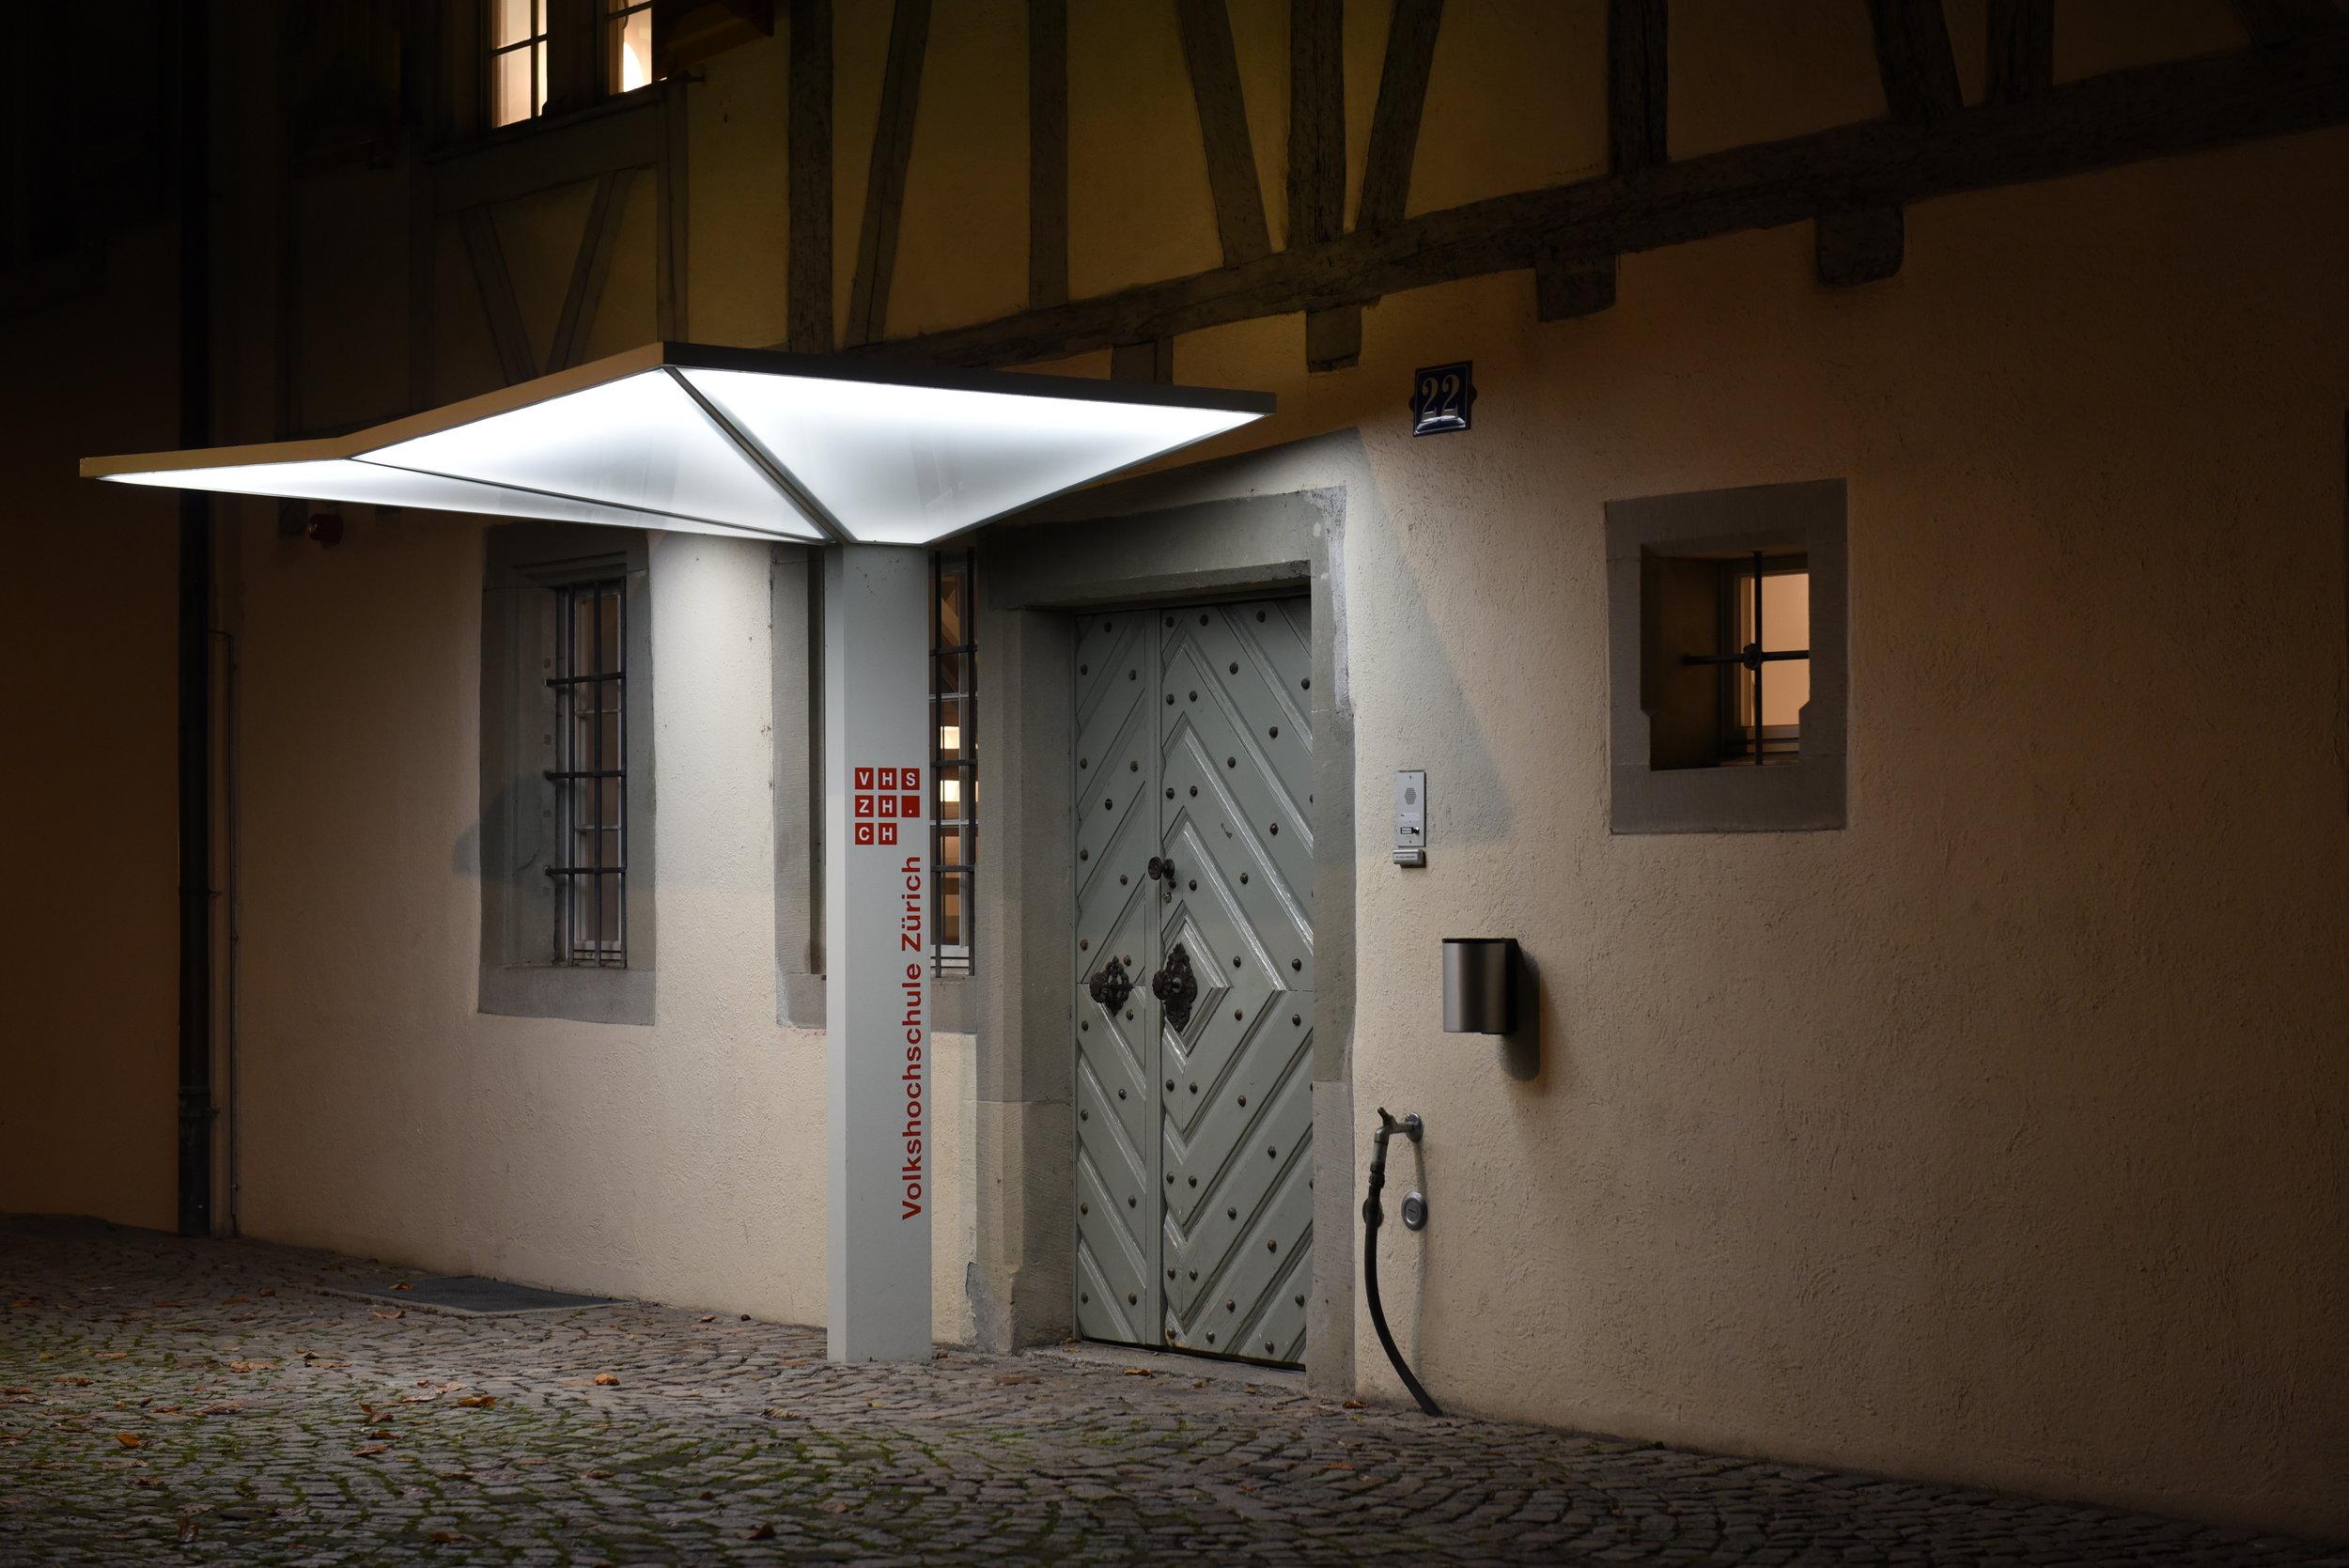 3D Vordach mit LED-Beleuchtung